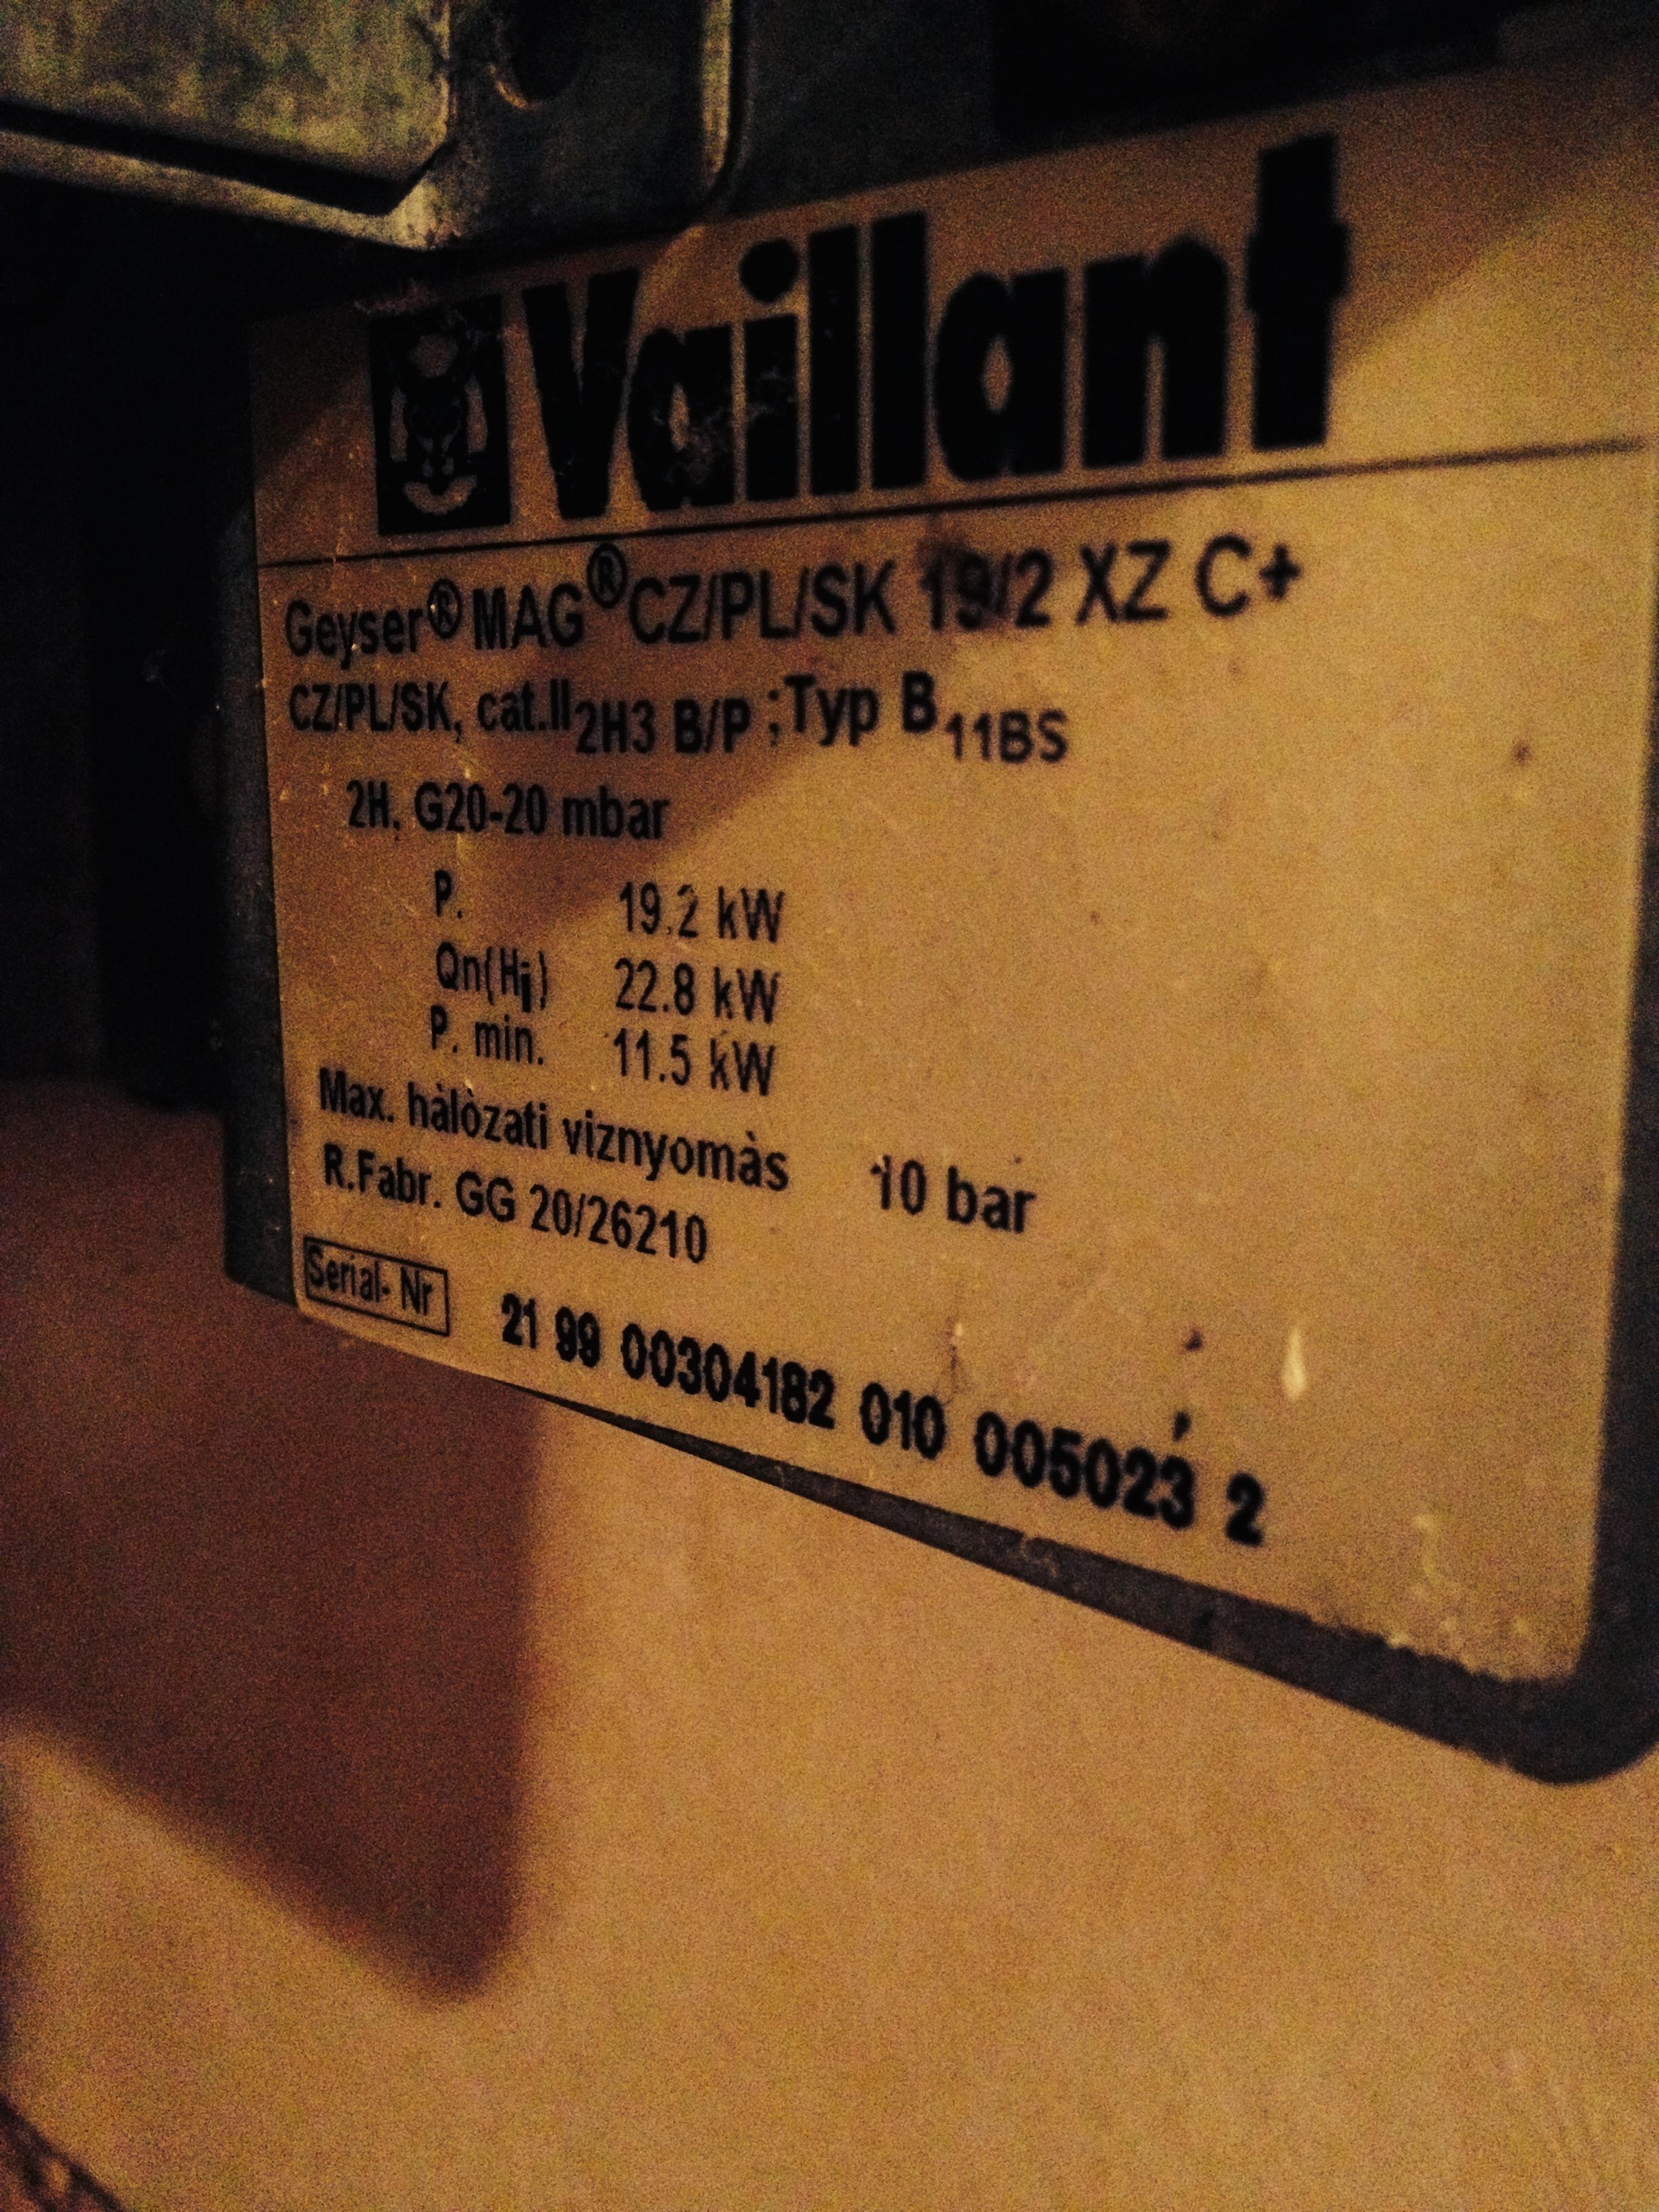 Vaillant Geyser Mag 19/2 XZ C+: palnik leje wod�